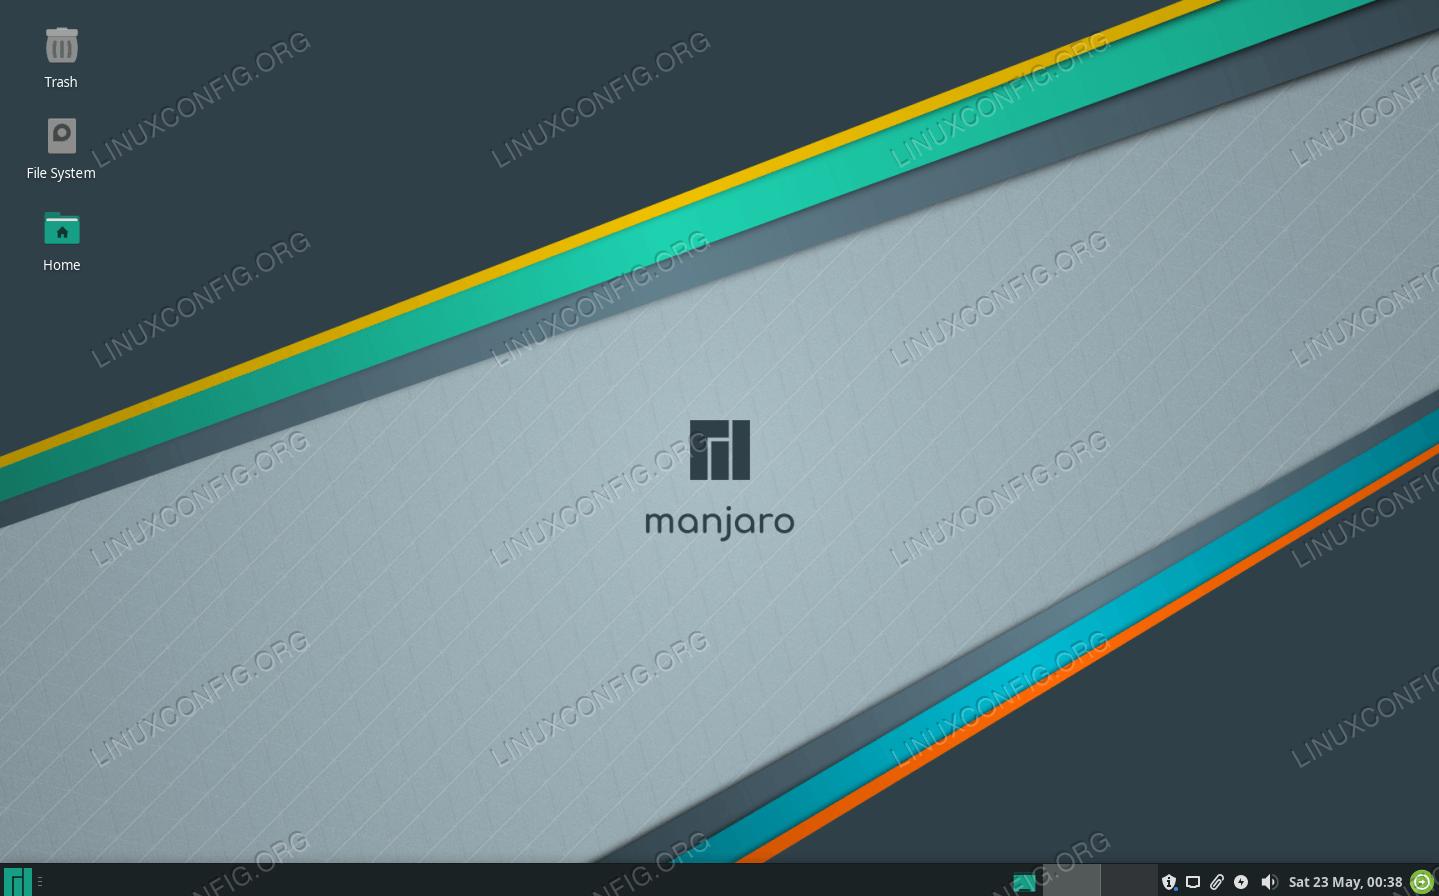 Manjaro running Xfce desktop environment